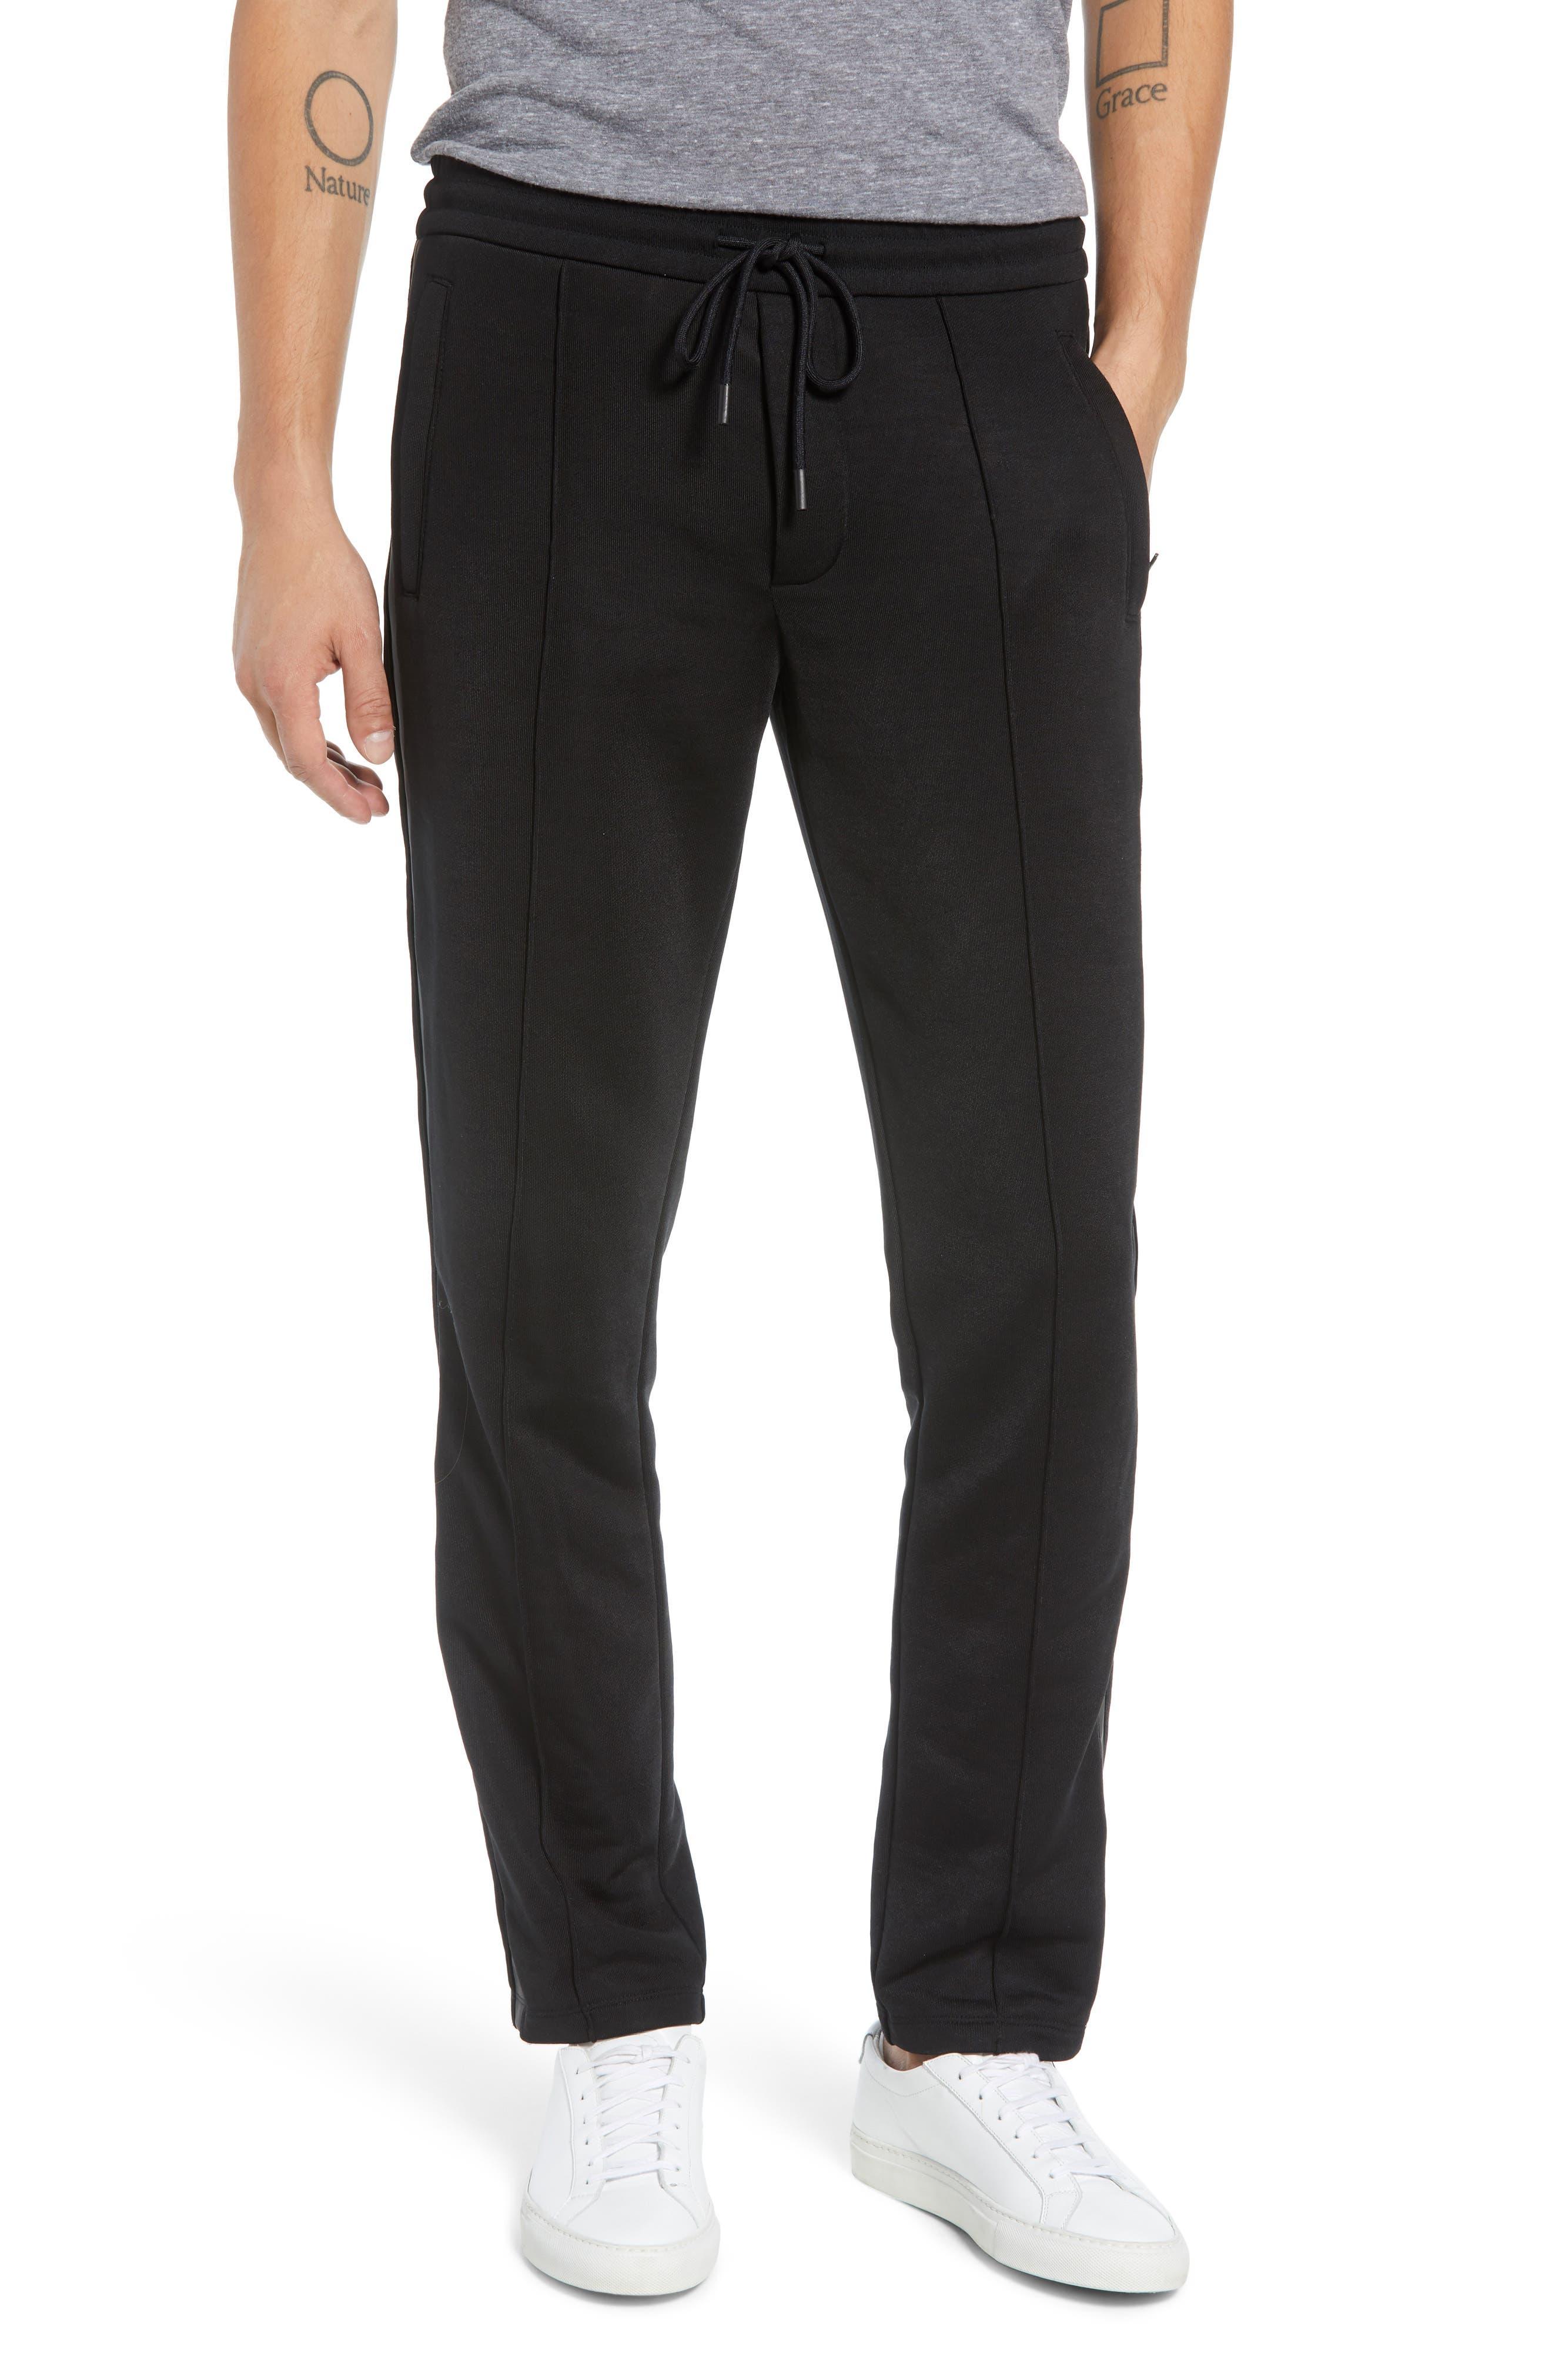 Heat Seal Classic Track Pants,                         Main,                         color, BLACK